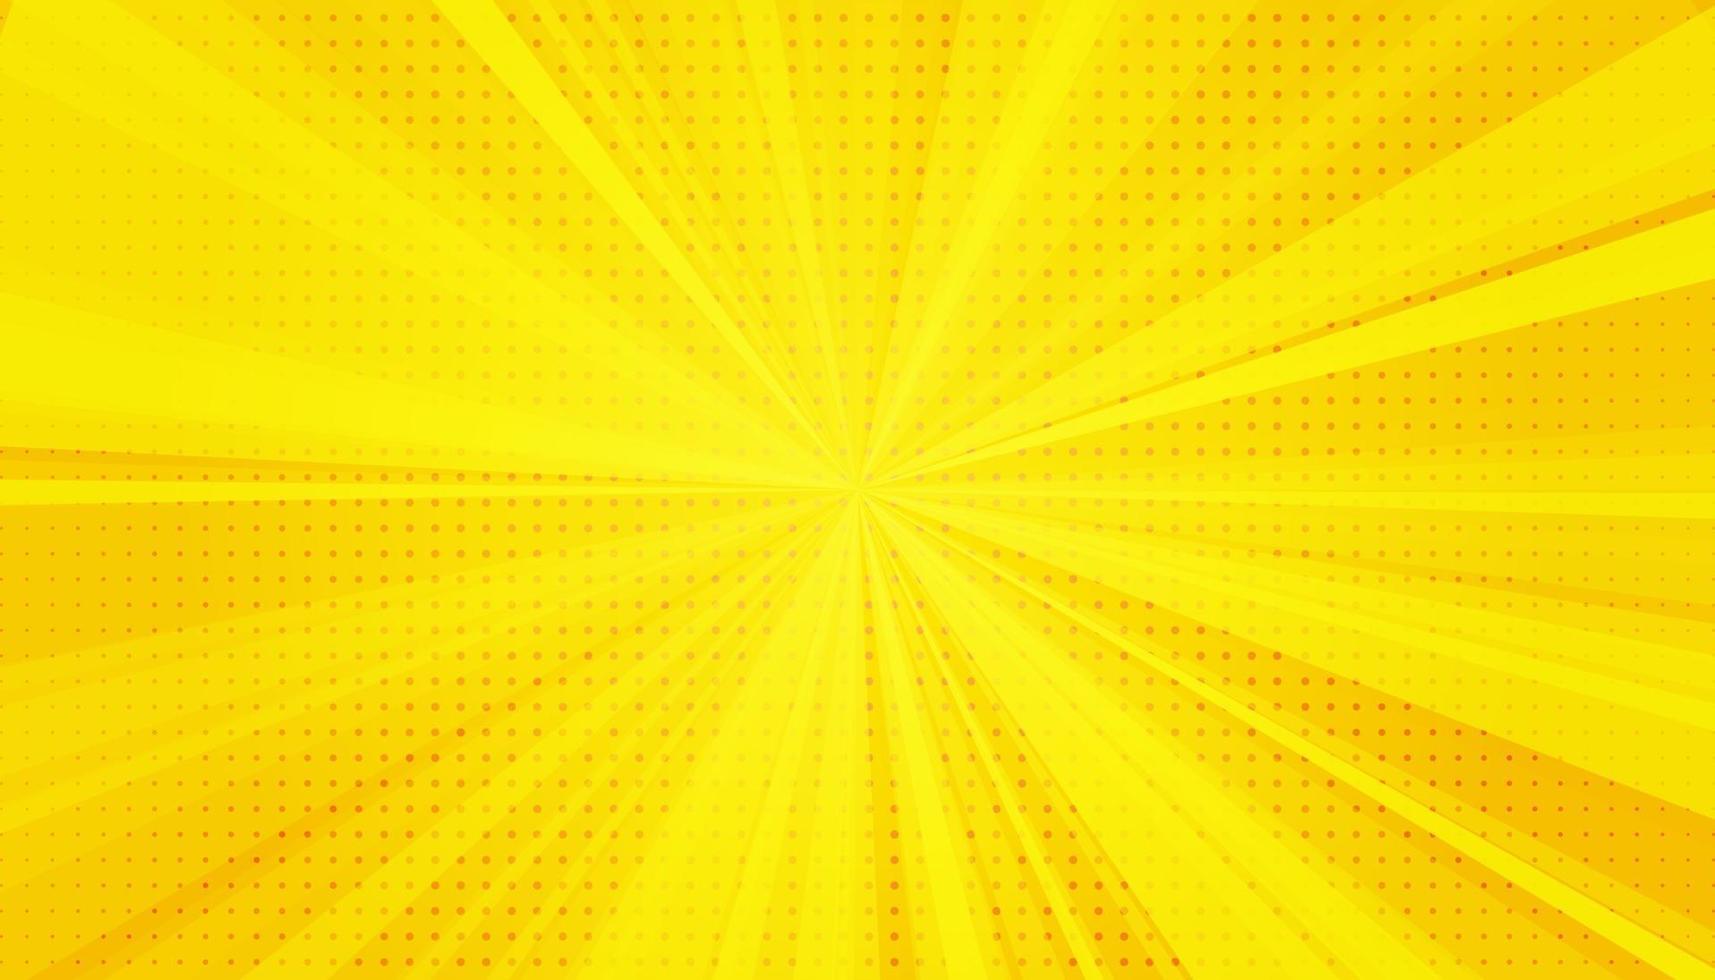 gelber Comic-Pop-Art-Hintergrund. Farbverlauf Halbton Pop Art Retro-Stil vektor